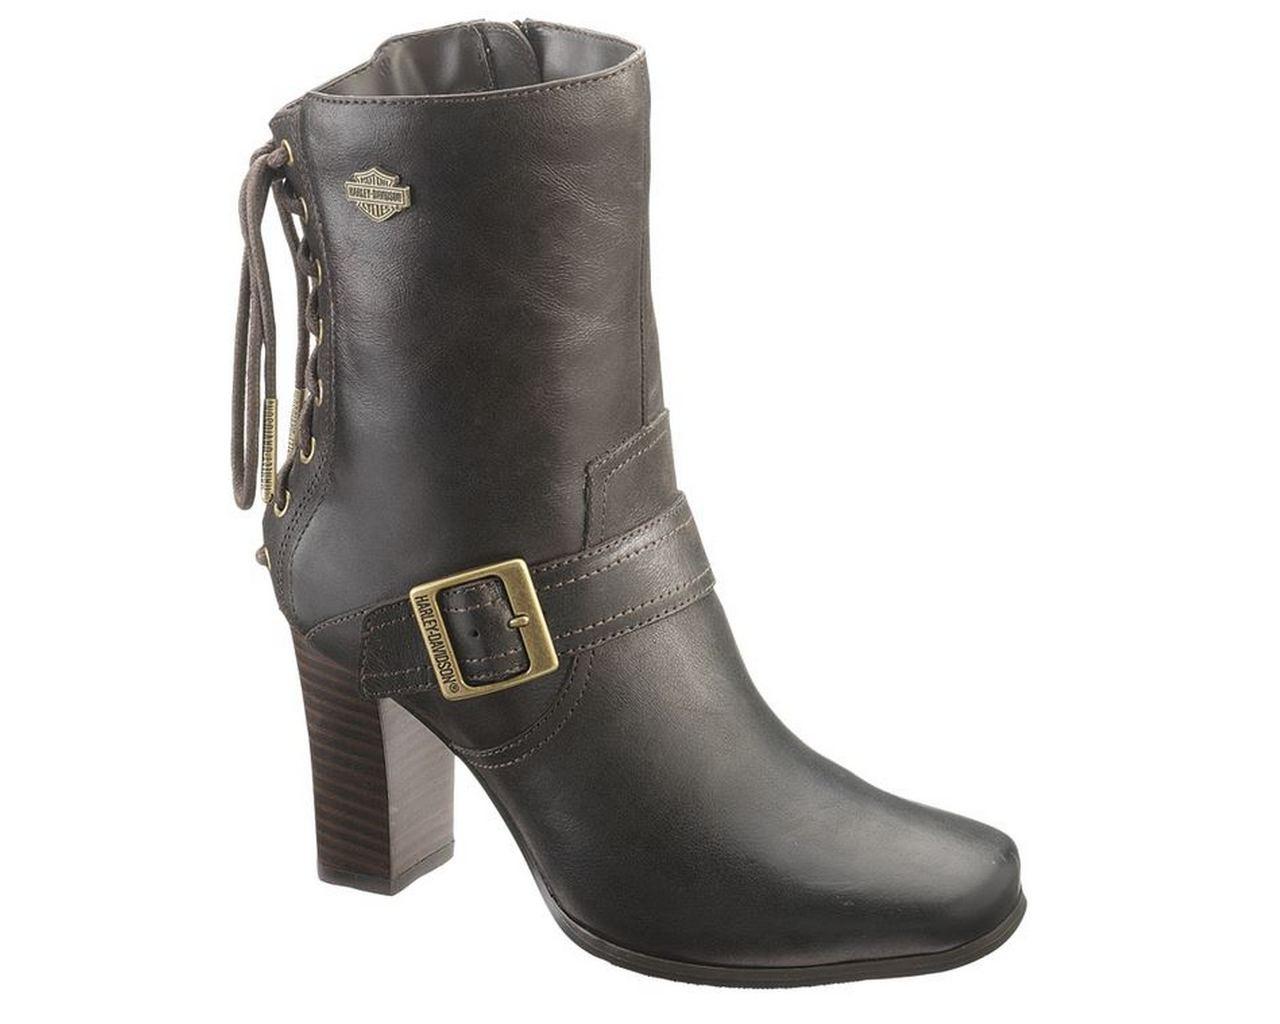 560570032f Harley-Davidson® Women's Shanna 7-Inch Black or Brown High Heel Boots.  D83678